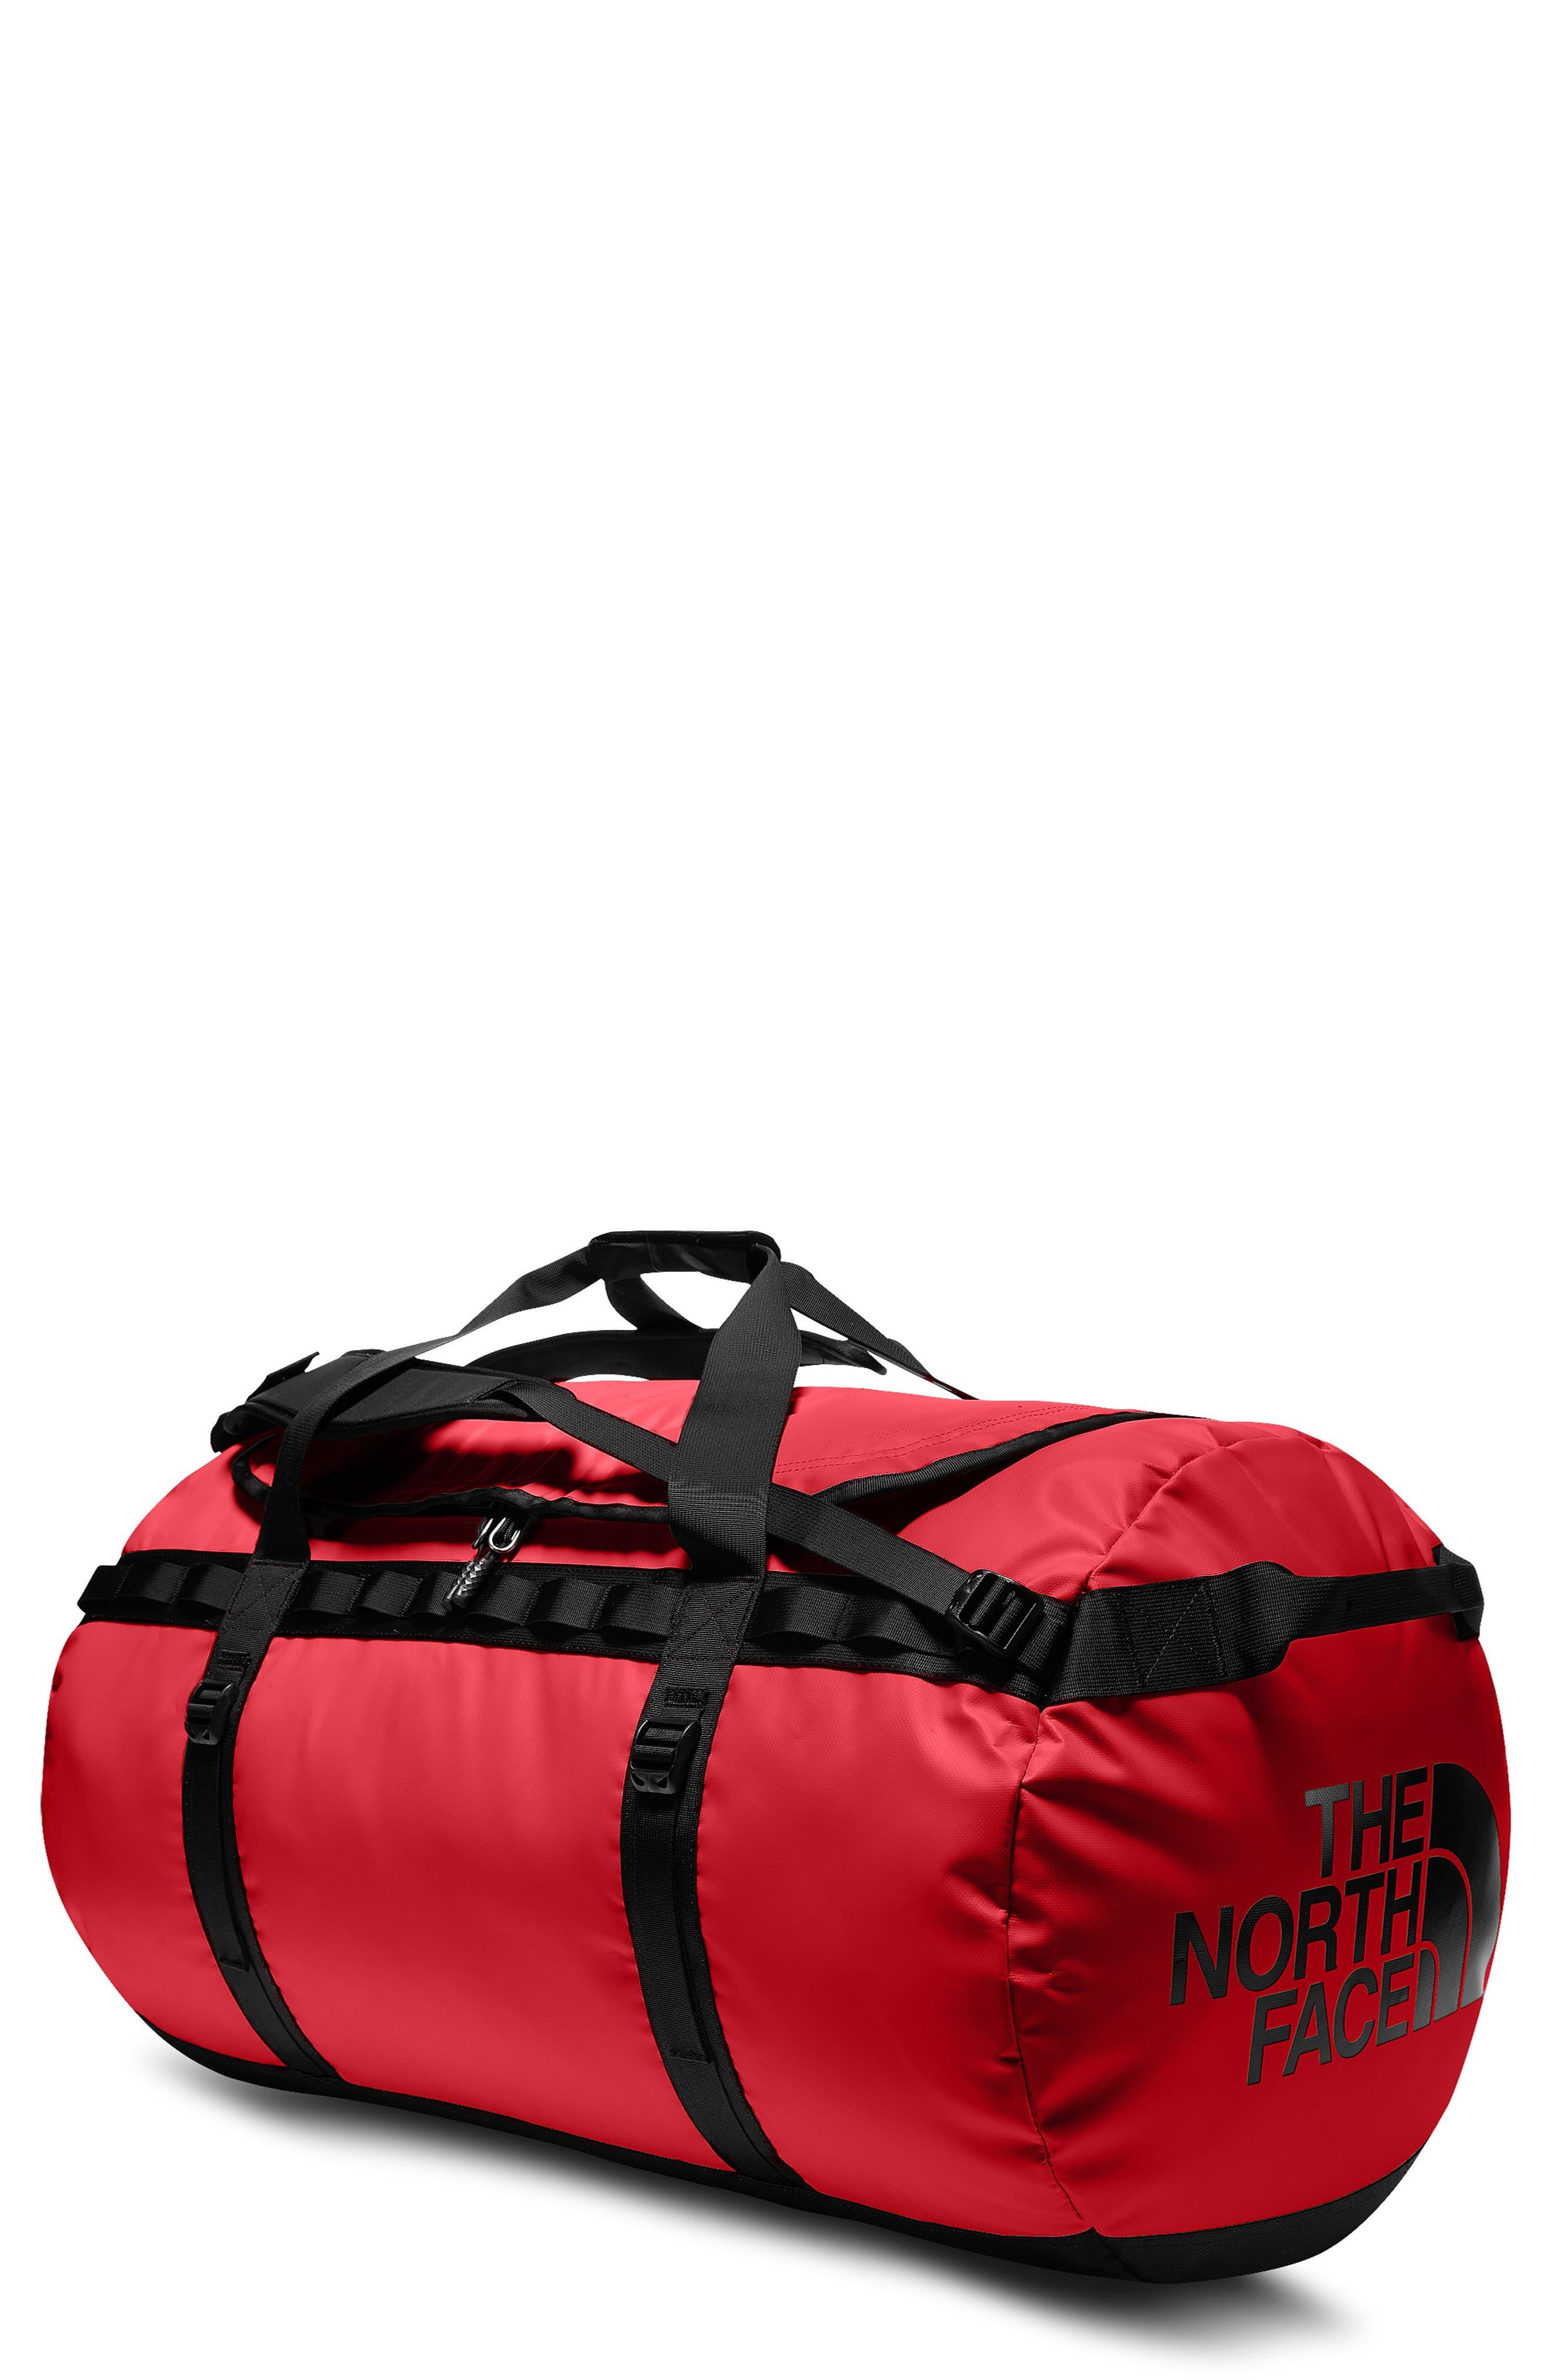 THE NORTH FACE, Base Camp XL Duffle Bag, Main thumbnail 1, color, RED/ BLACK